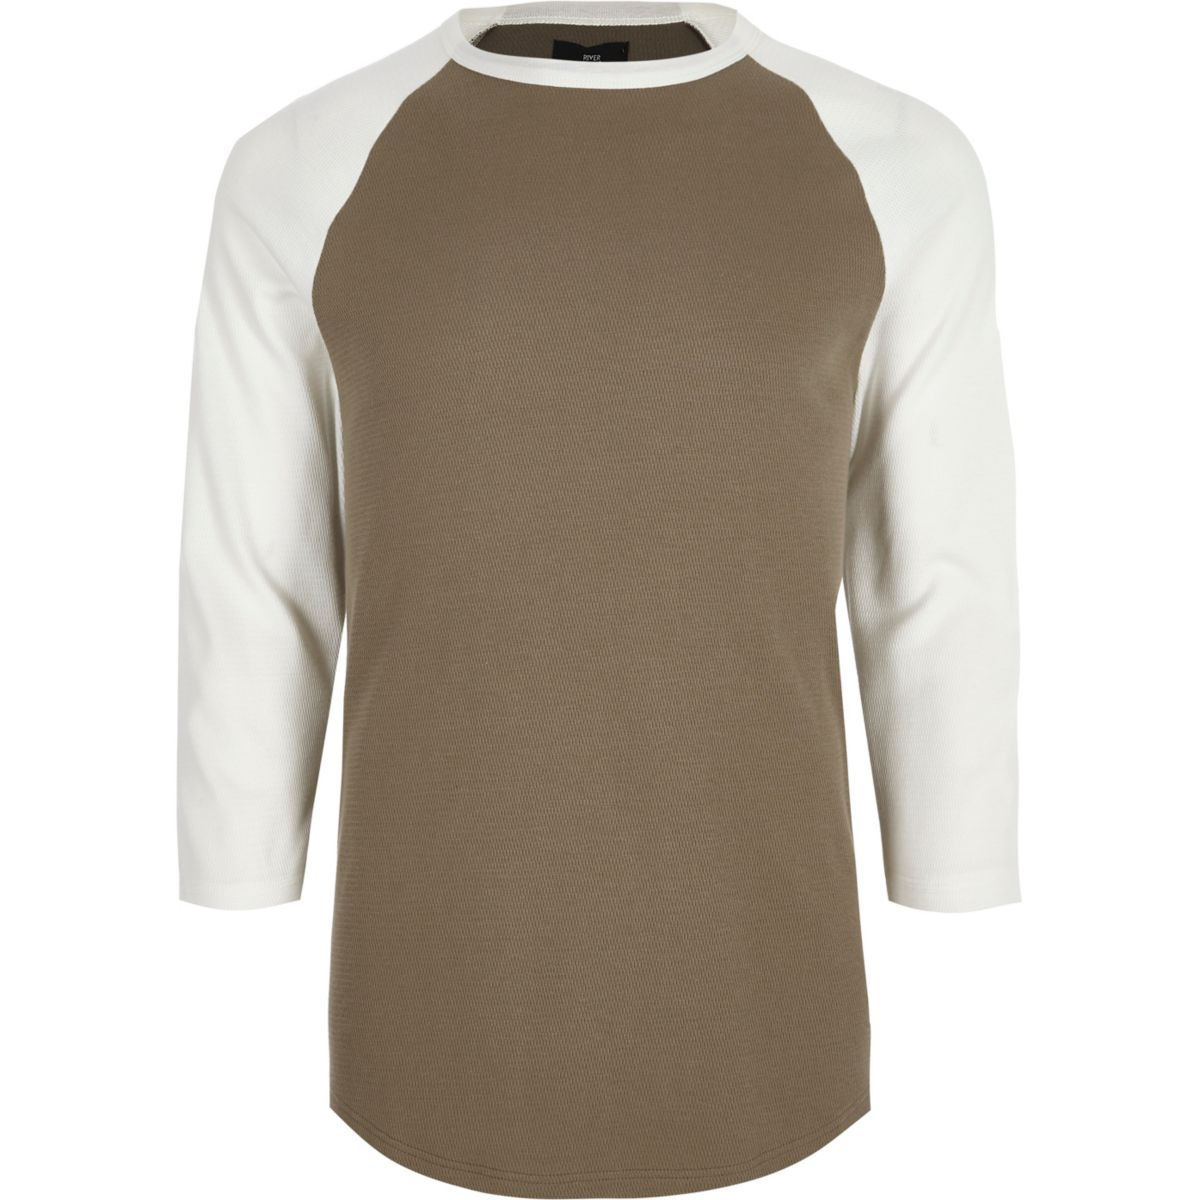 Yellow three quarter raglan sleeve T-shirt